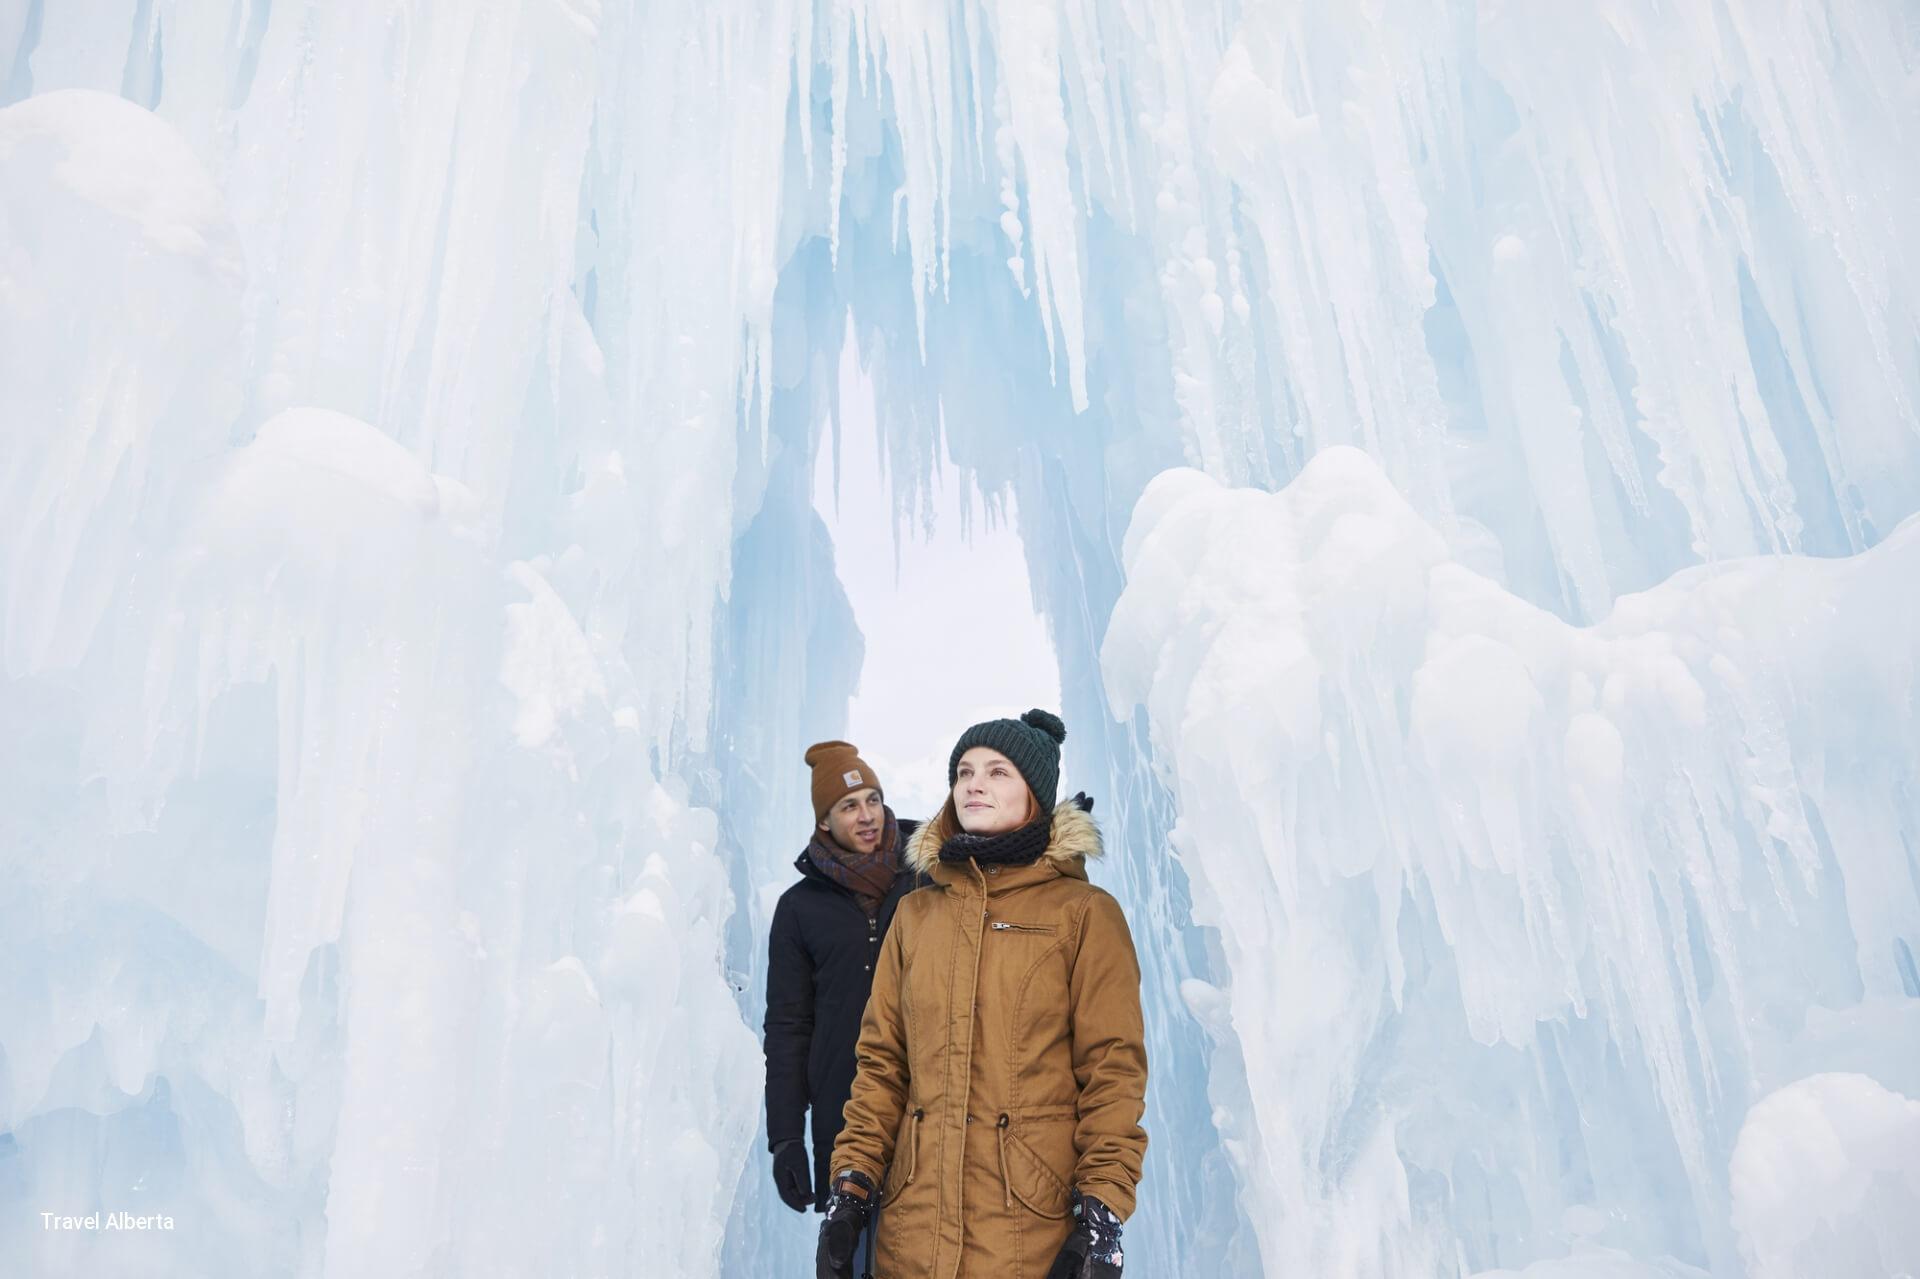 Canadian Rockies Winter Tours